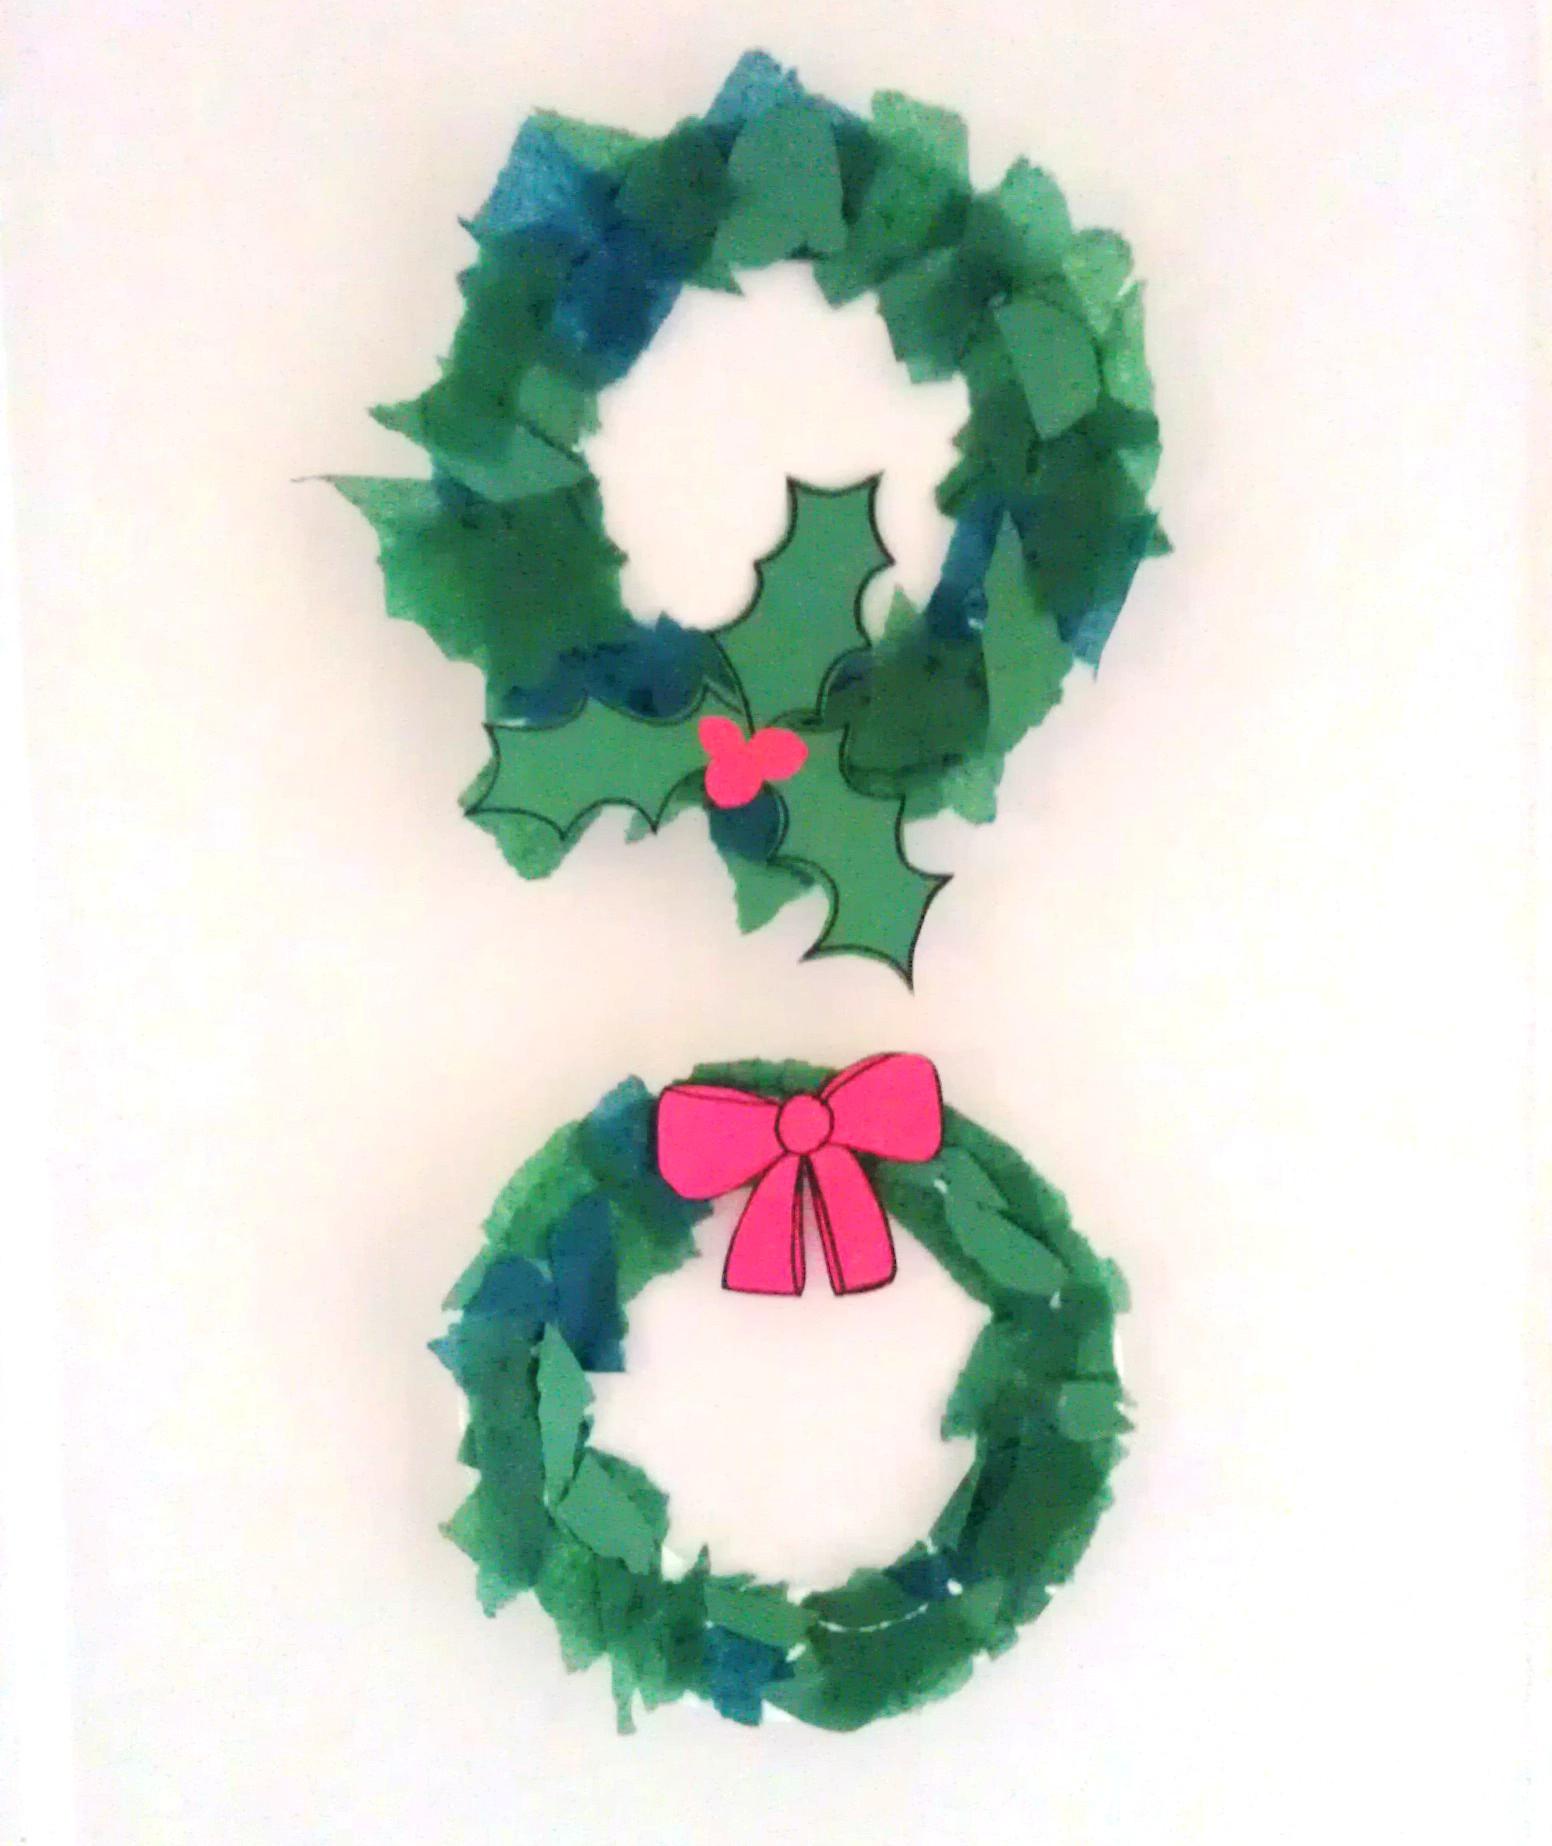 Wreath 4 Final Wreath